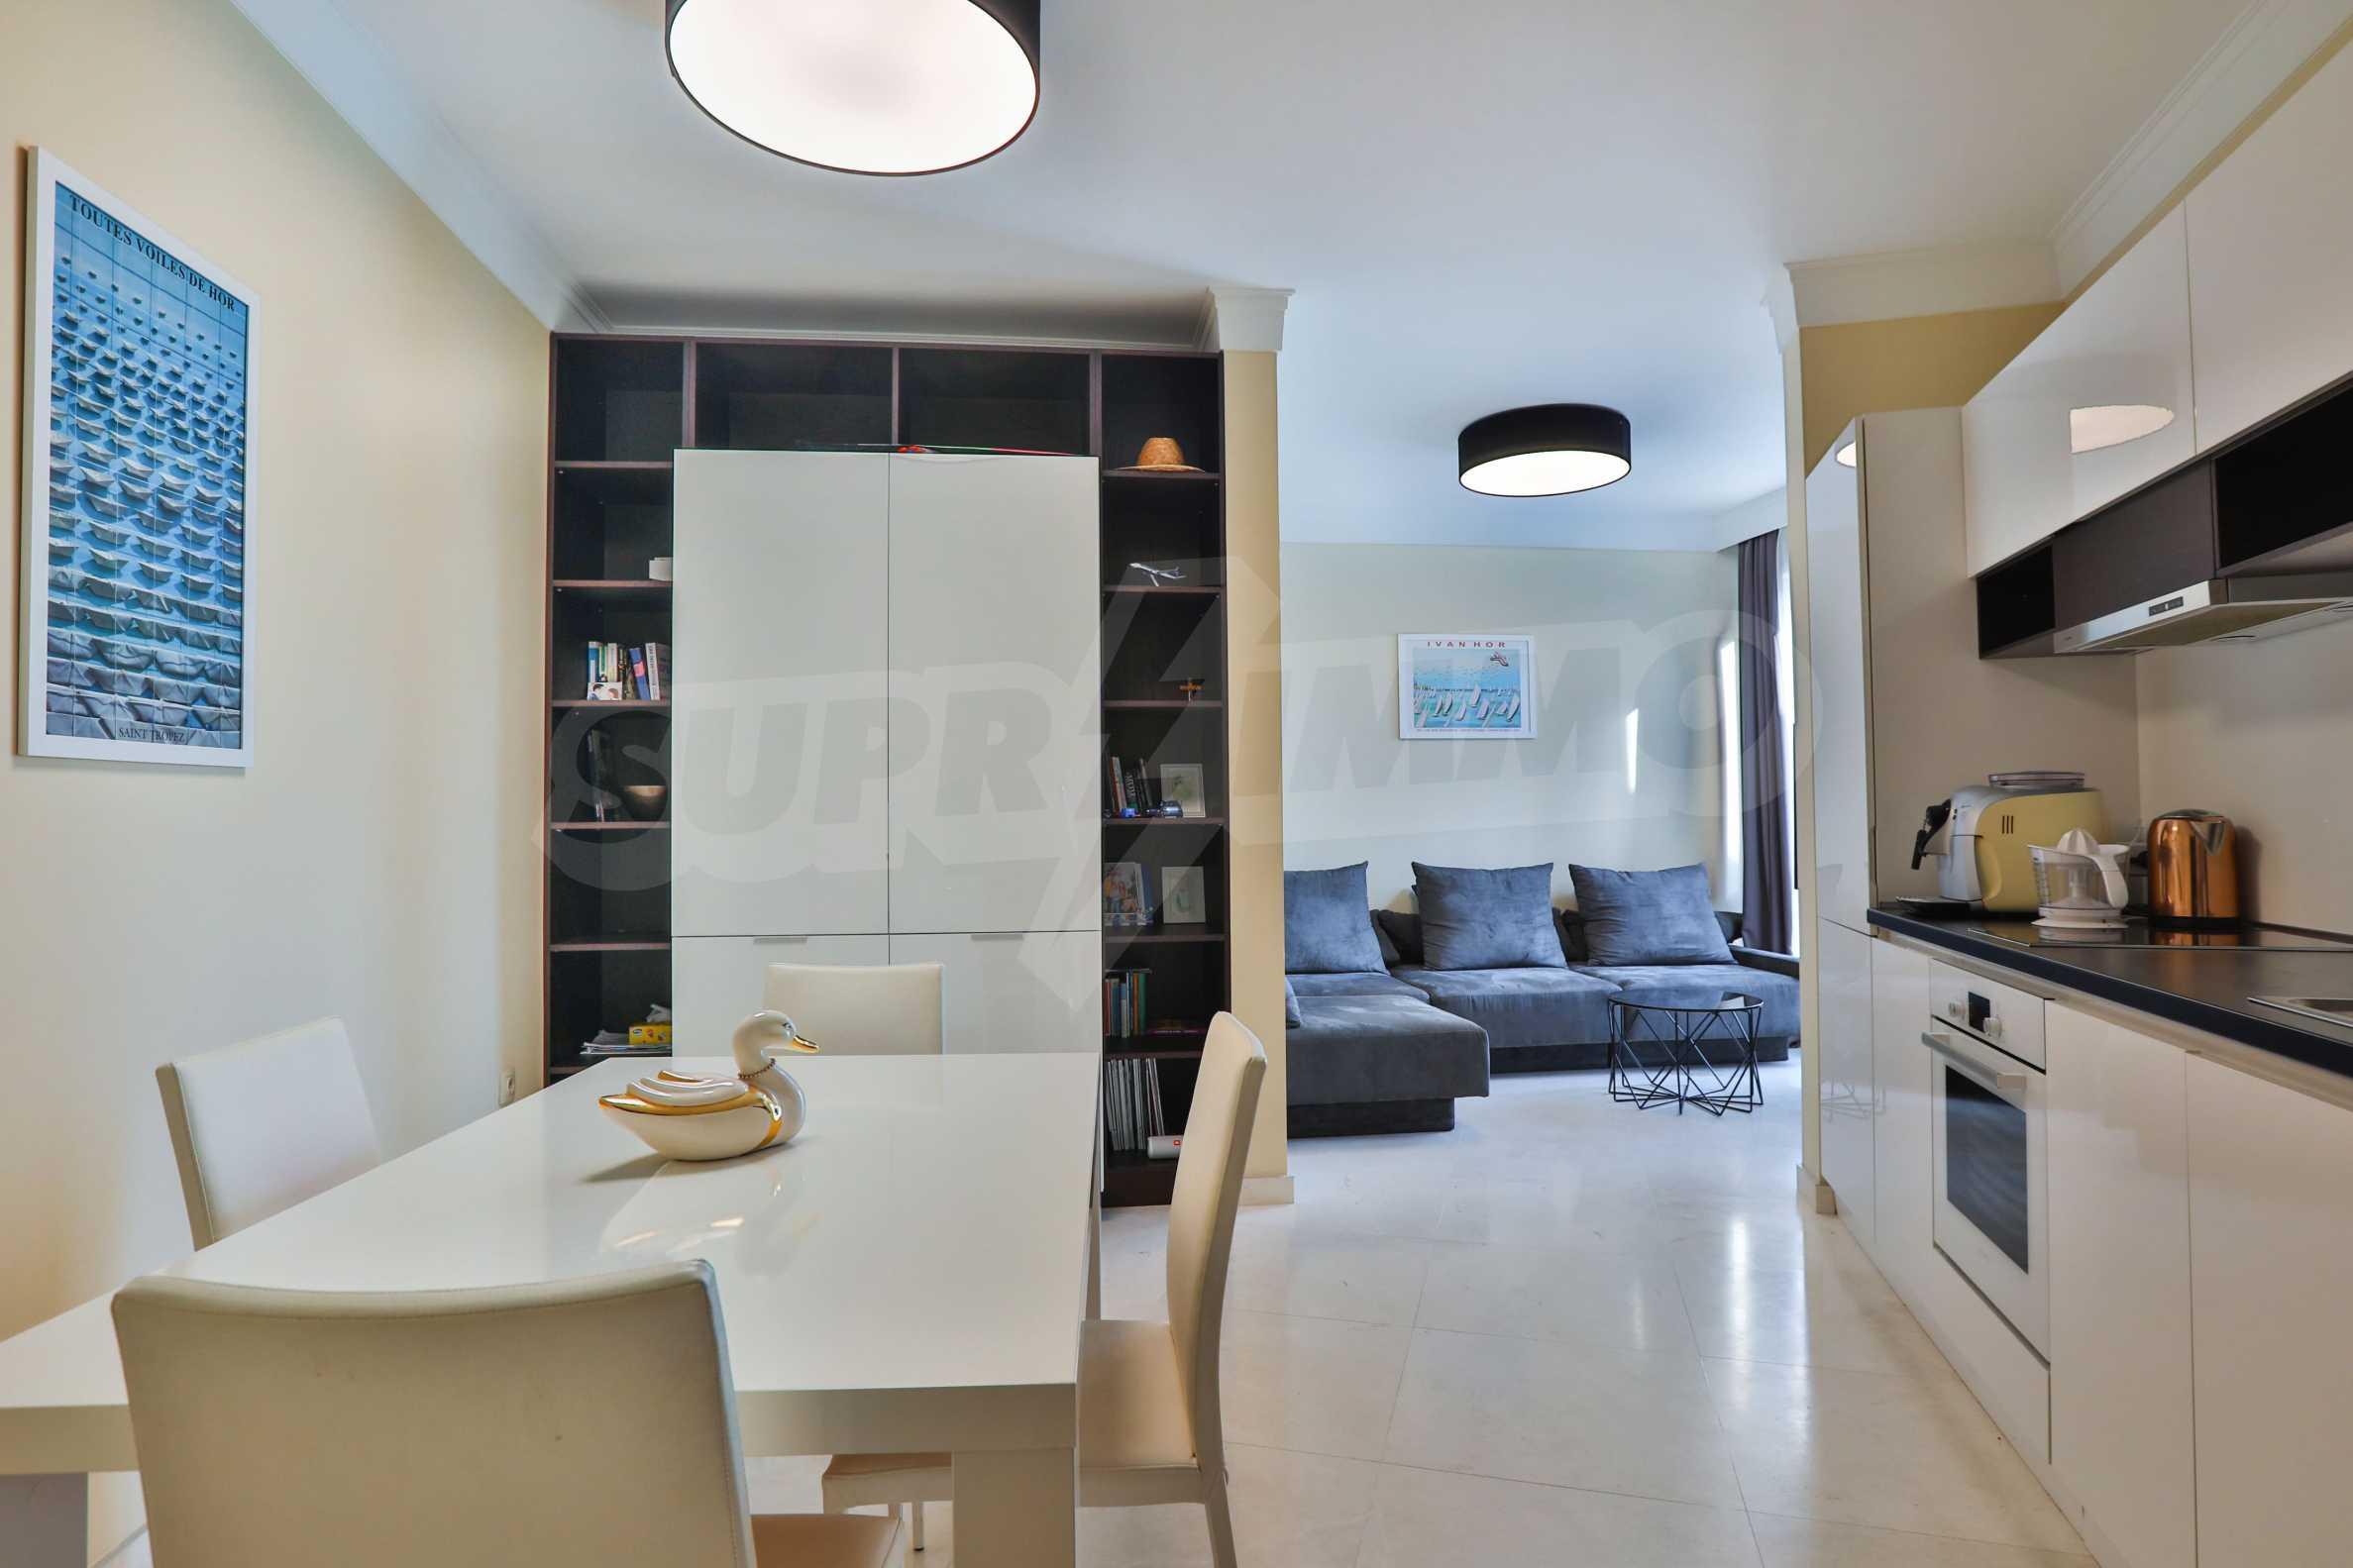 Дизайнерски тристаен апартамент под наем за летен сезон в резиденция Belle Époque в Лозенец 2